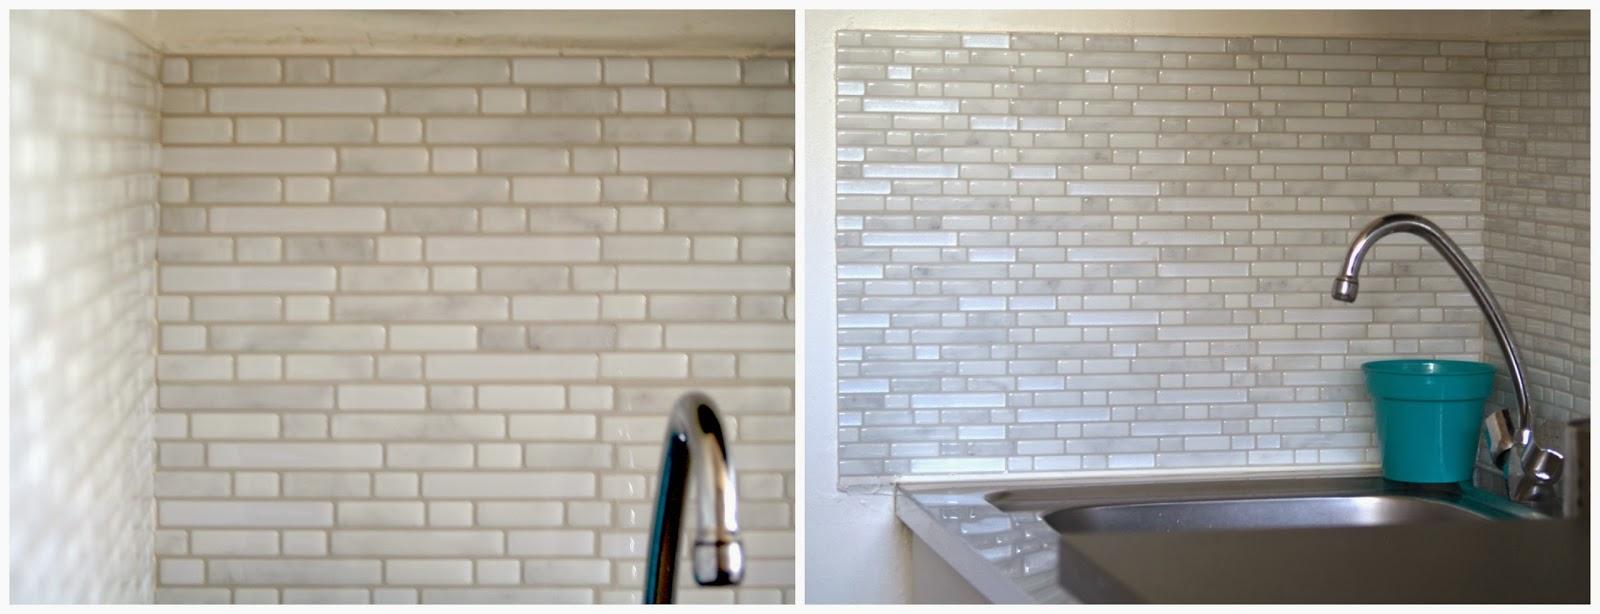 j 39 ai test le carrelage mural adh sif smart tiles valy 39 s blog. Black Bedroom Furniture Sets. Home Design Ideas